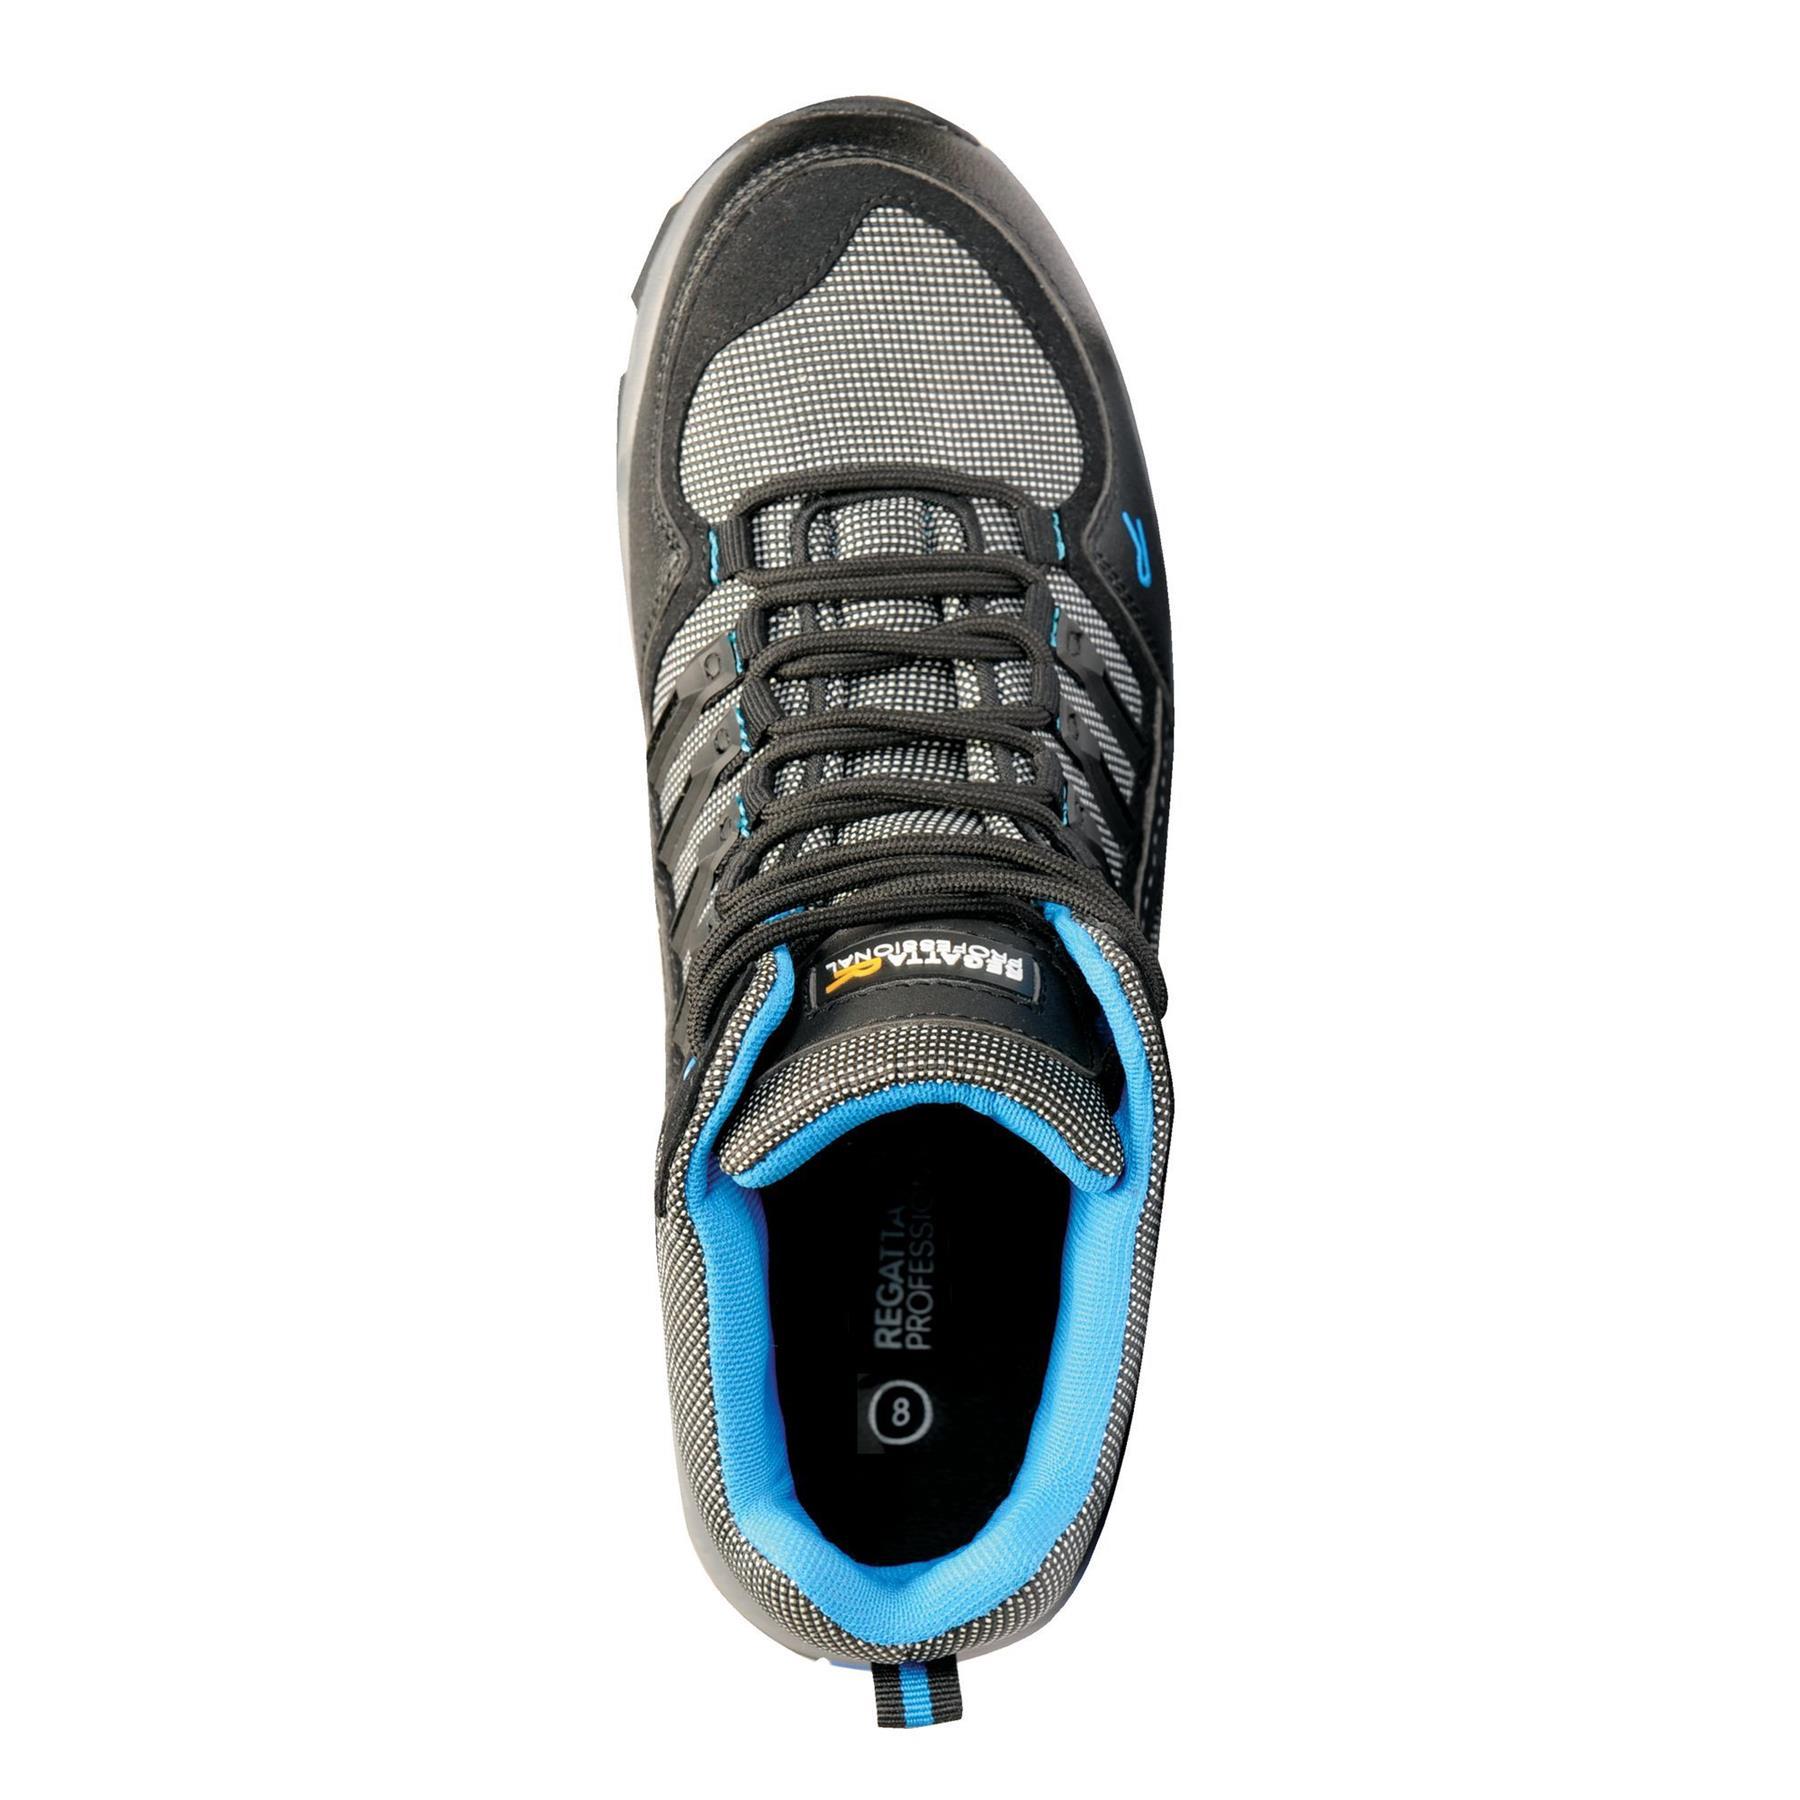 miniatuur 8 - Regatta Mens Work Safety Protective Shoes Steel Toe Cap Boots Workwear